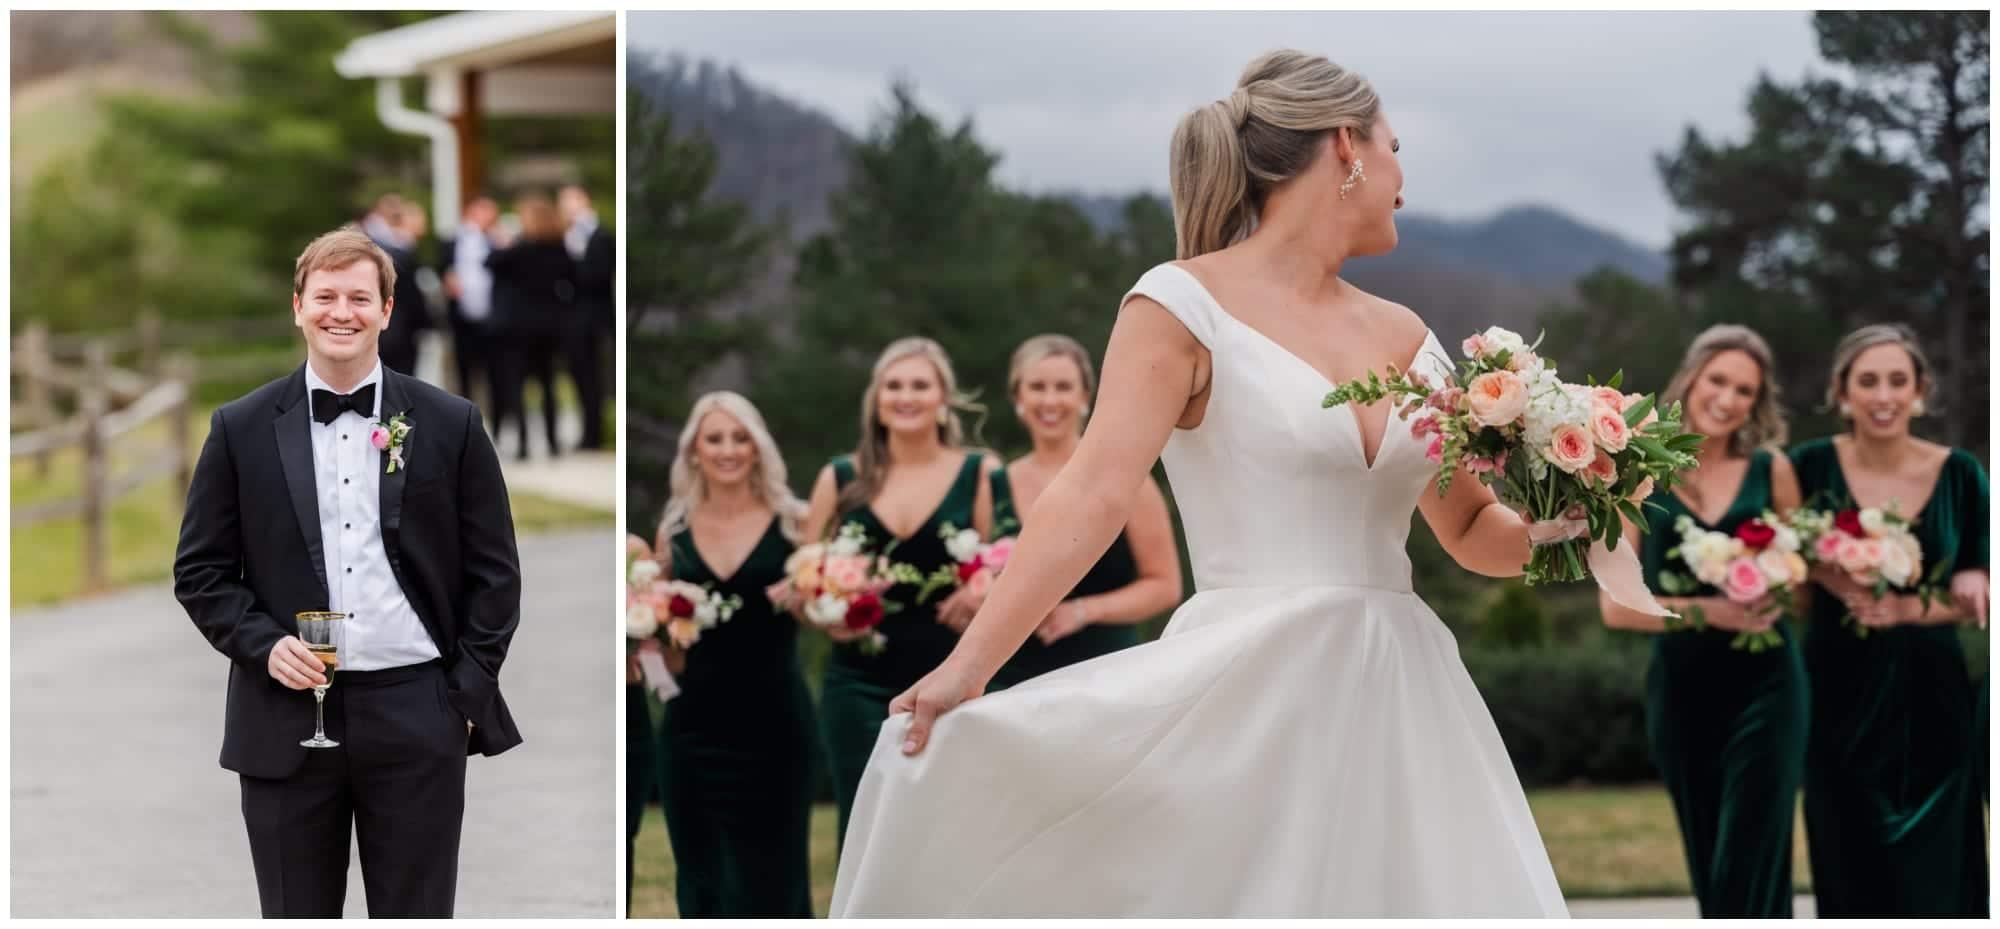 Bride and Groomsmen outdoors at Chestnut Ridge Wedding Venue